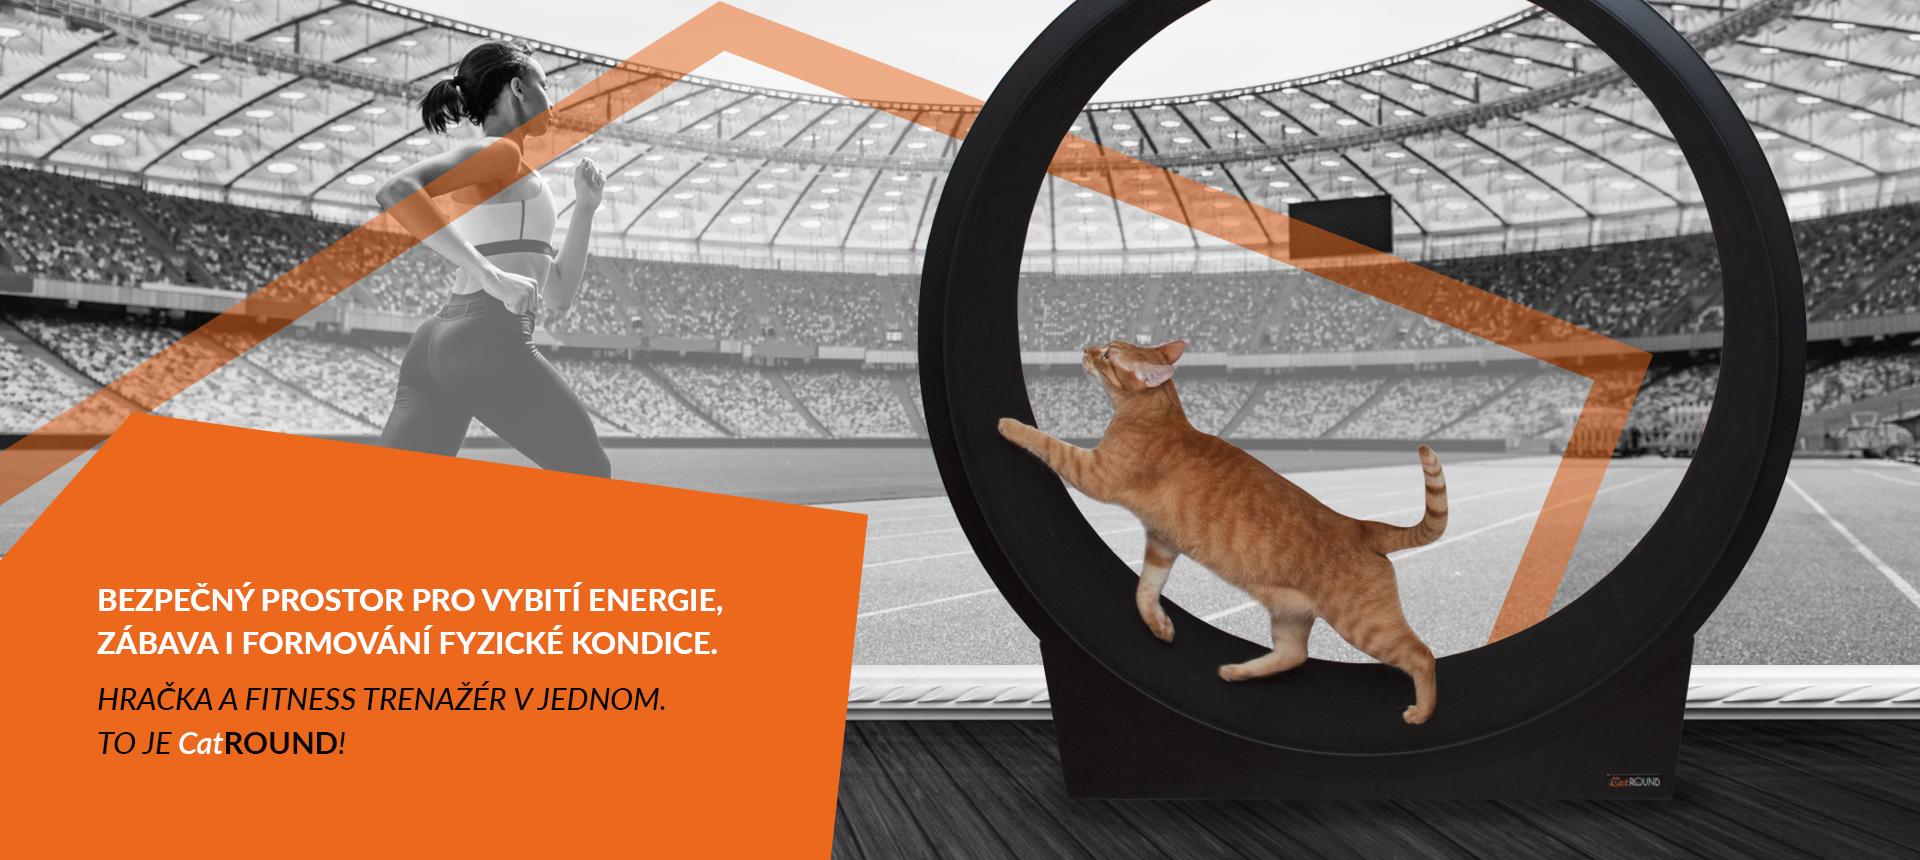 Bezpečný prostor pro vybití kočičí energie, hračka a fitnes trenér v jednom